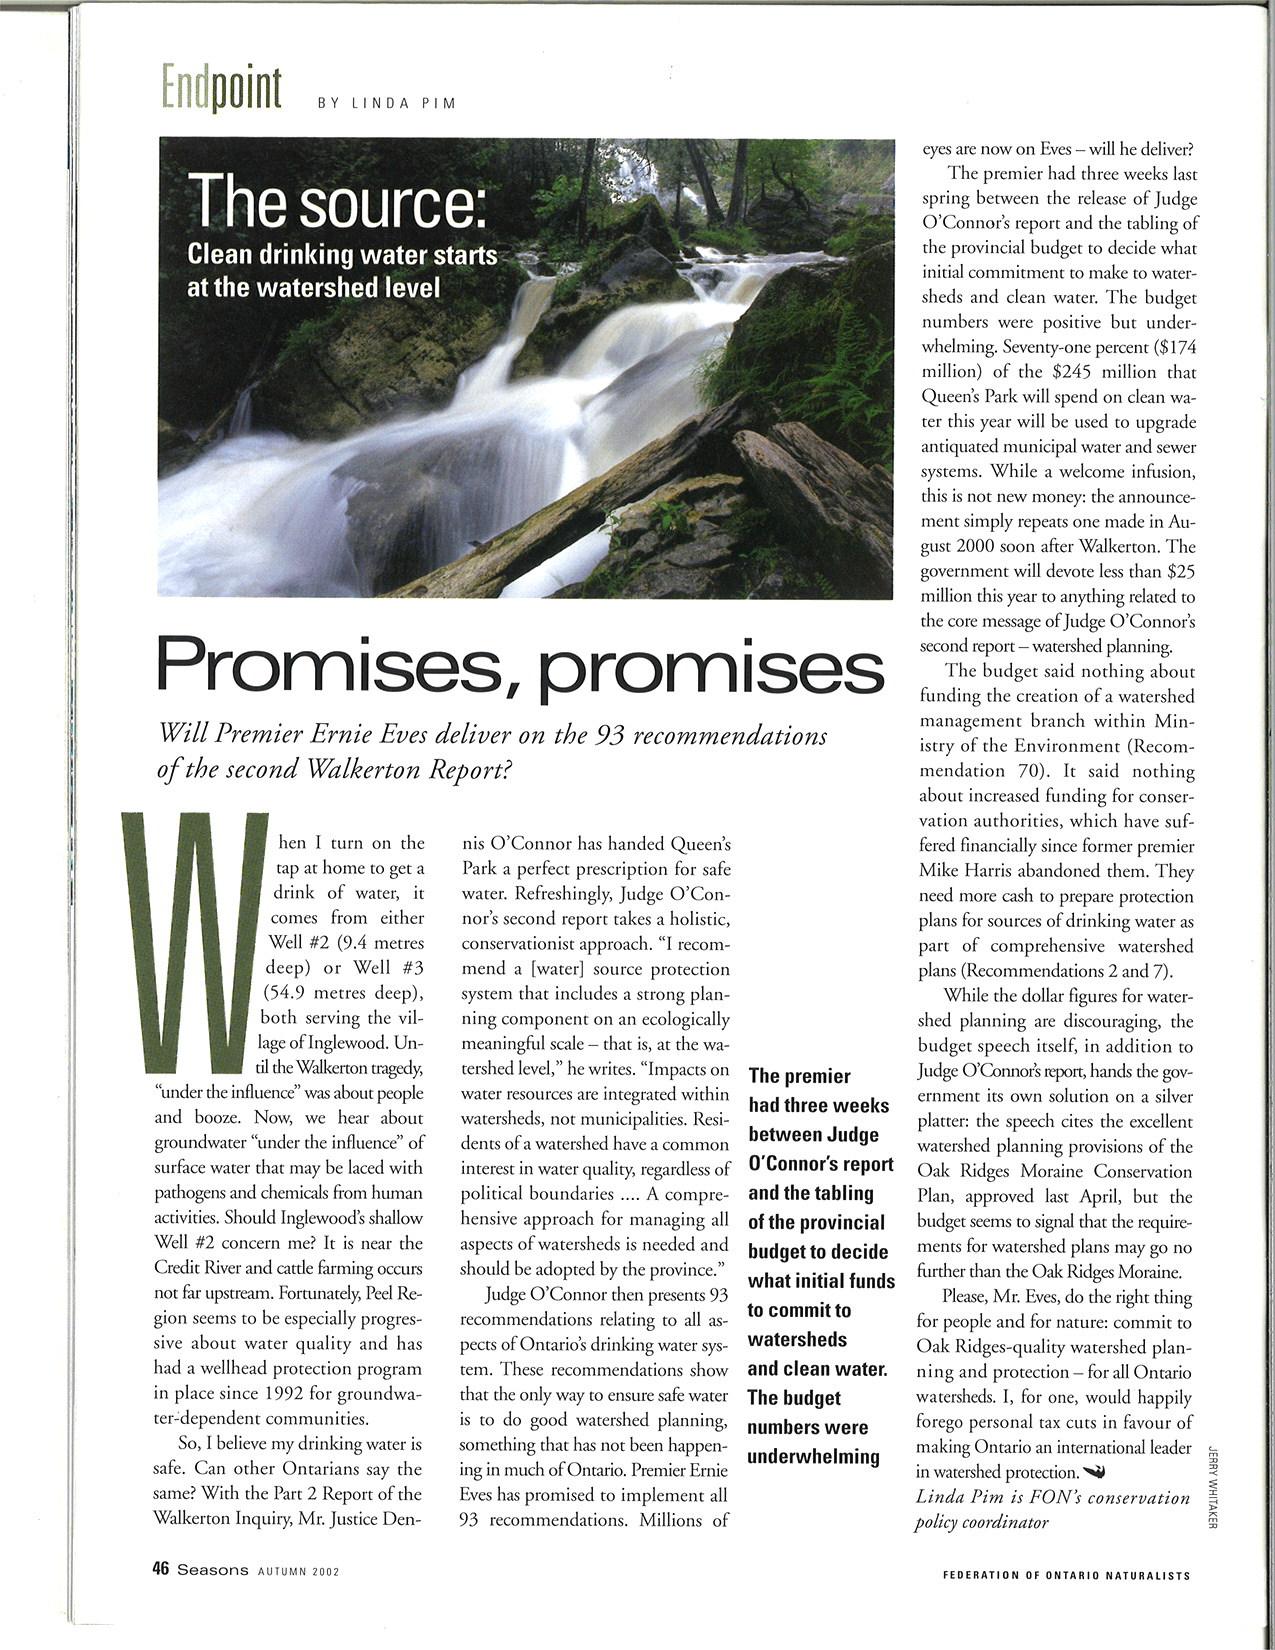 Endpoint: Promises, promises